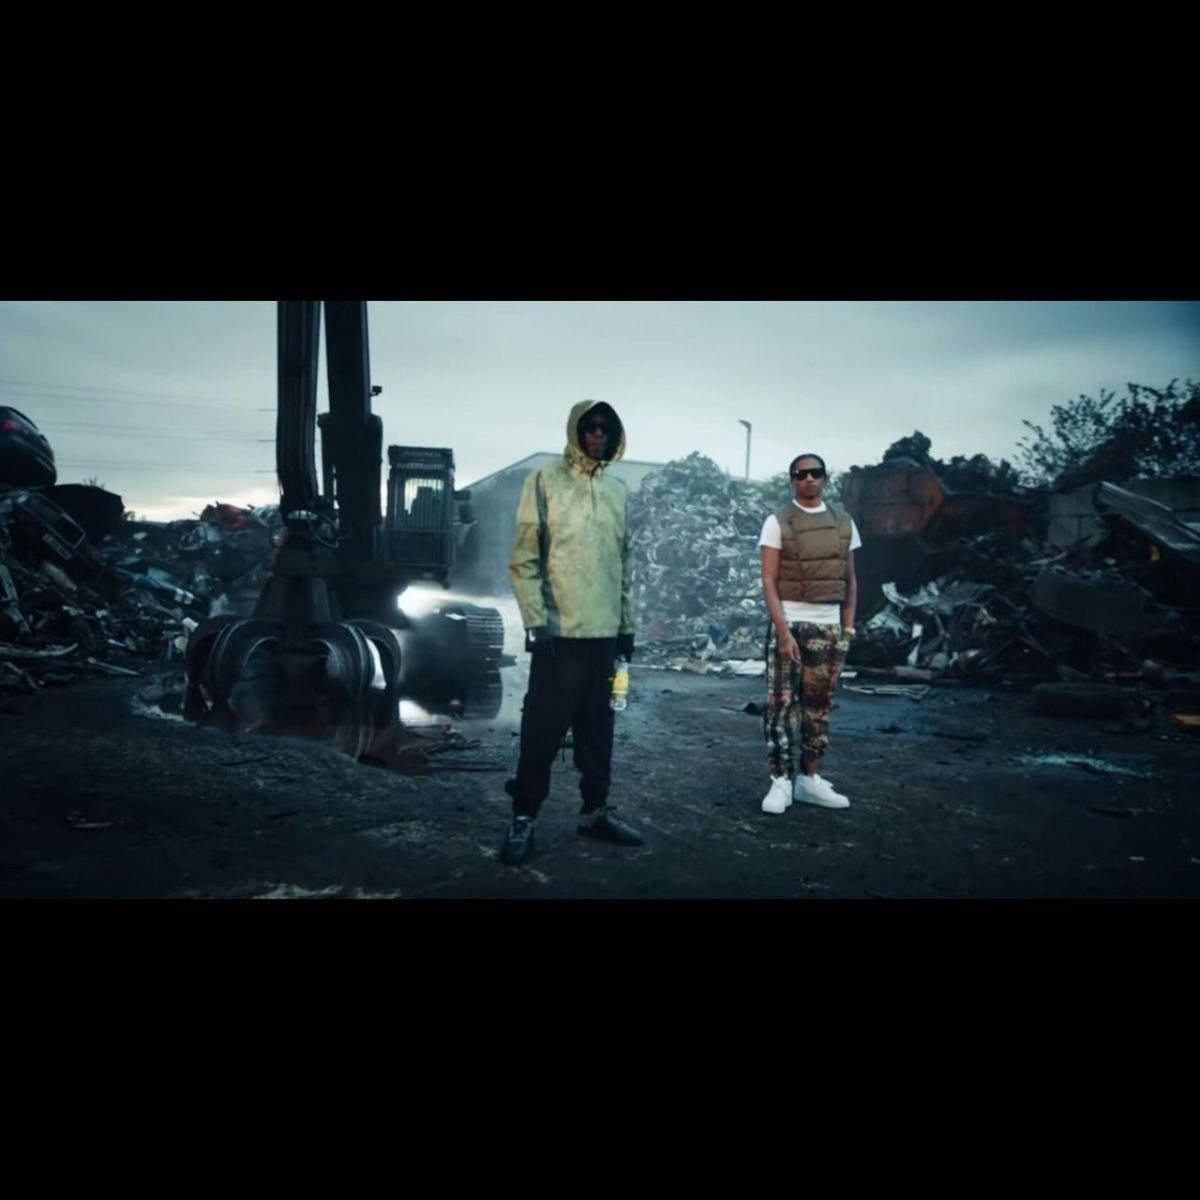 Sean D - Gotcha (ft. Vybz Kartel, Digga D and Unknown T) (Thumbnail)